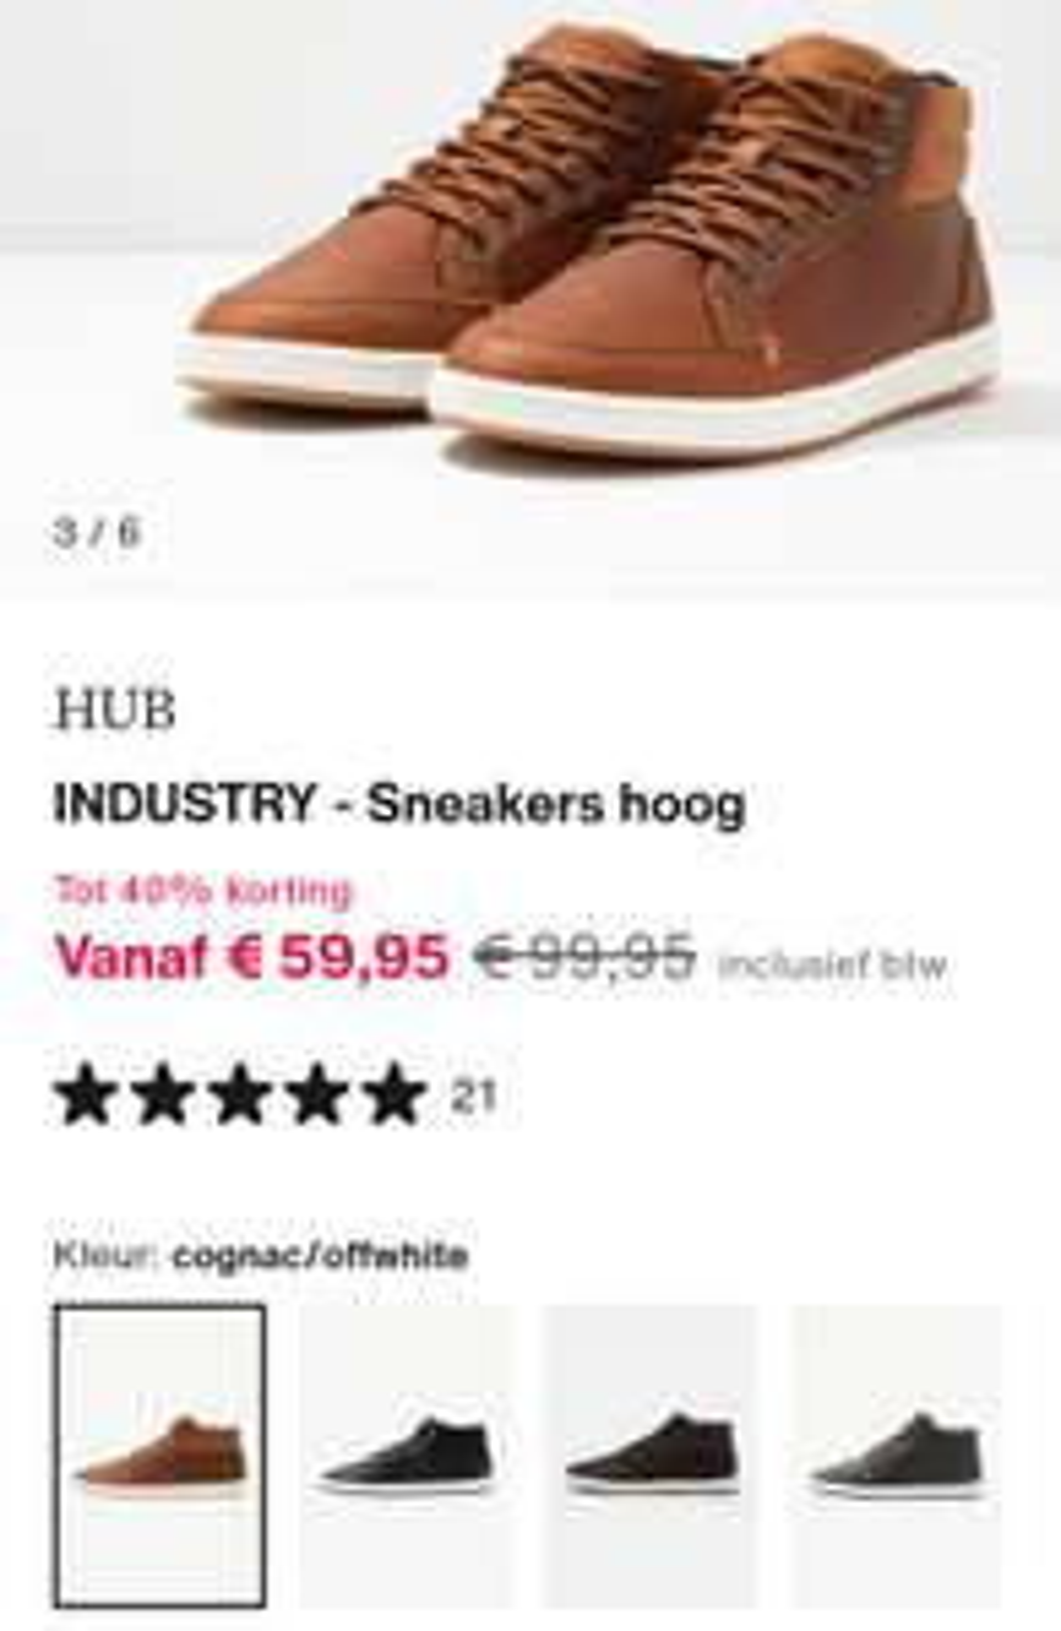 HUB Sneakers tot 50% korting bij Zalando mid-season sale.